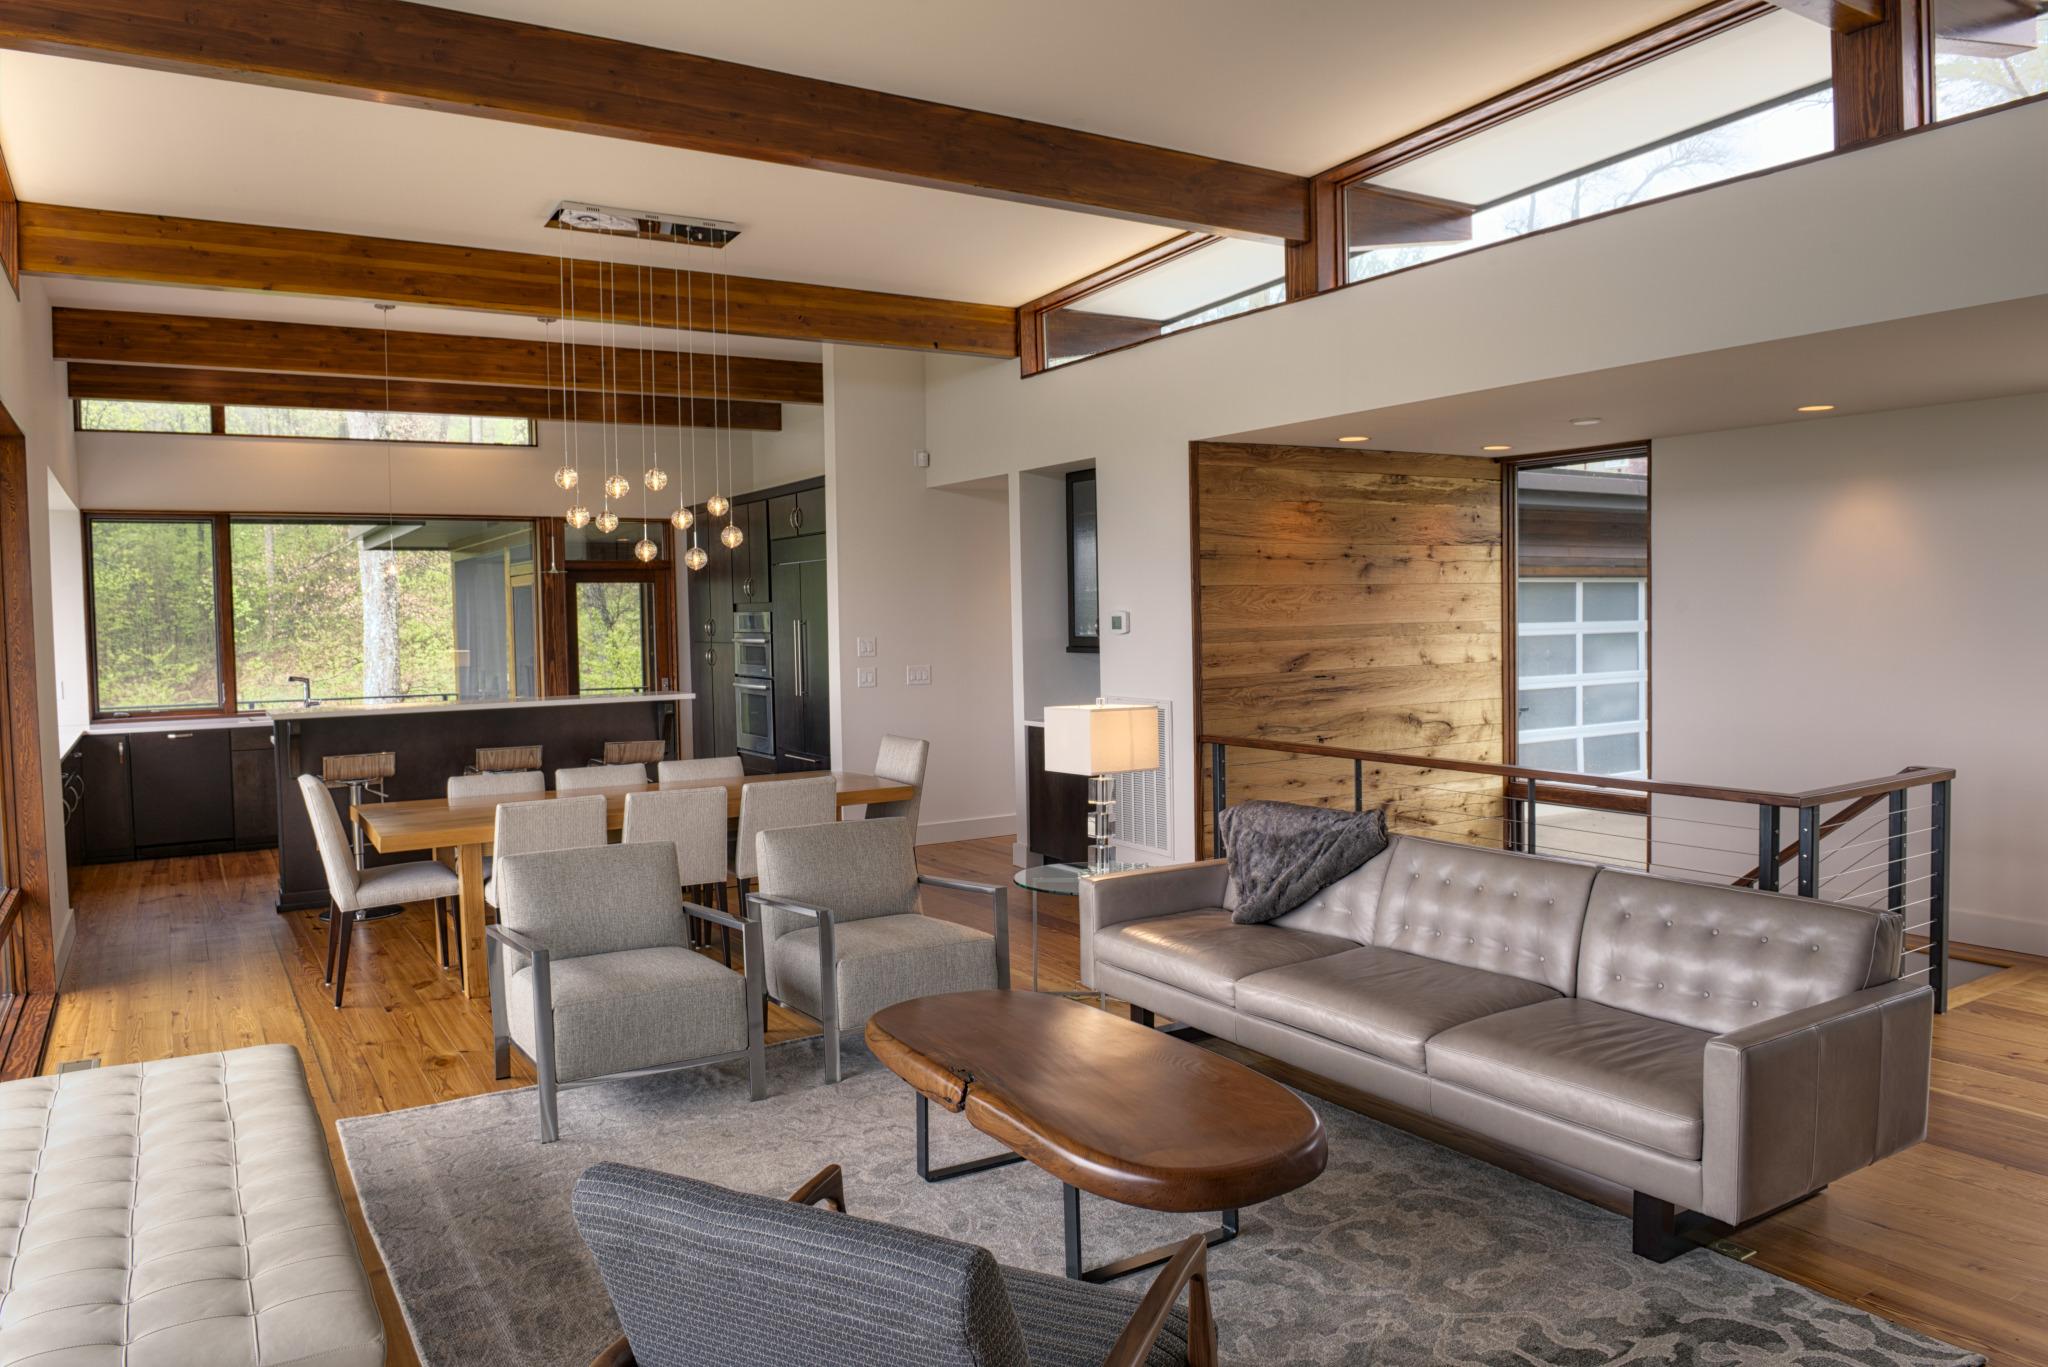 turkel_modern_design_prefab_home_sweet_repose_interior_living_room.jpg